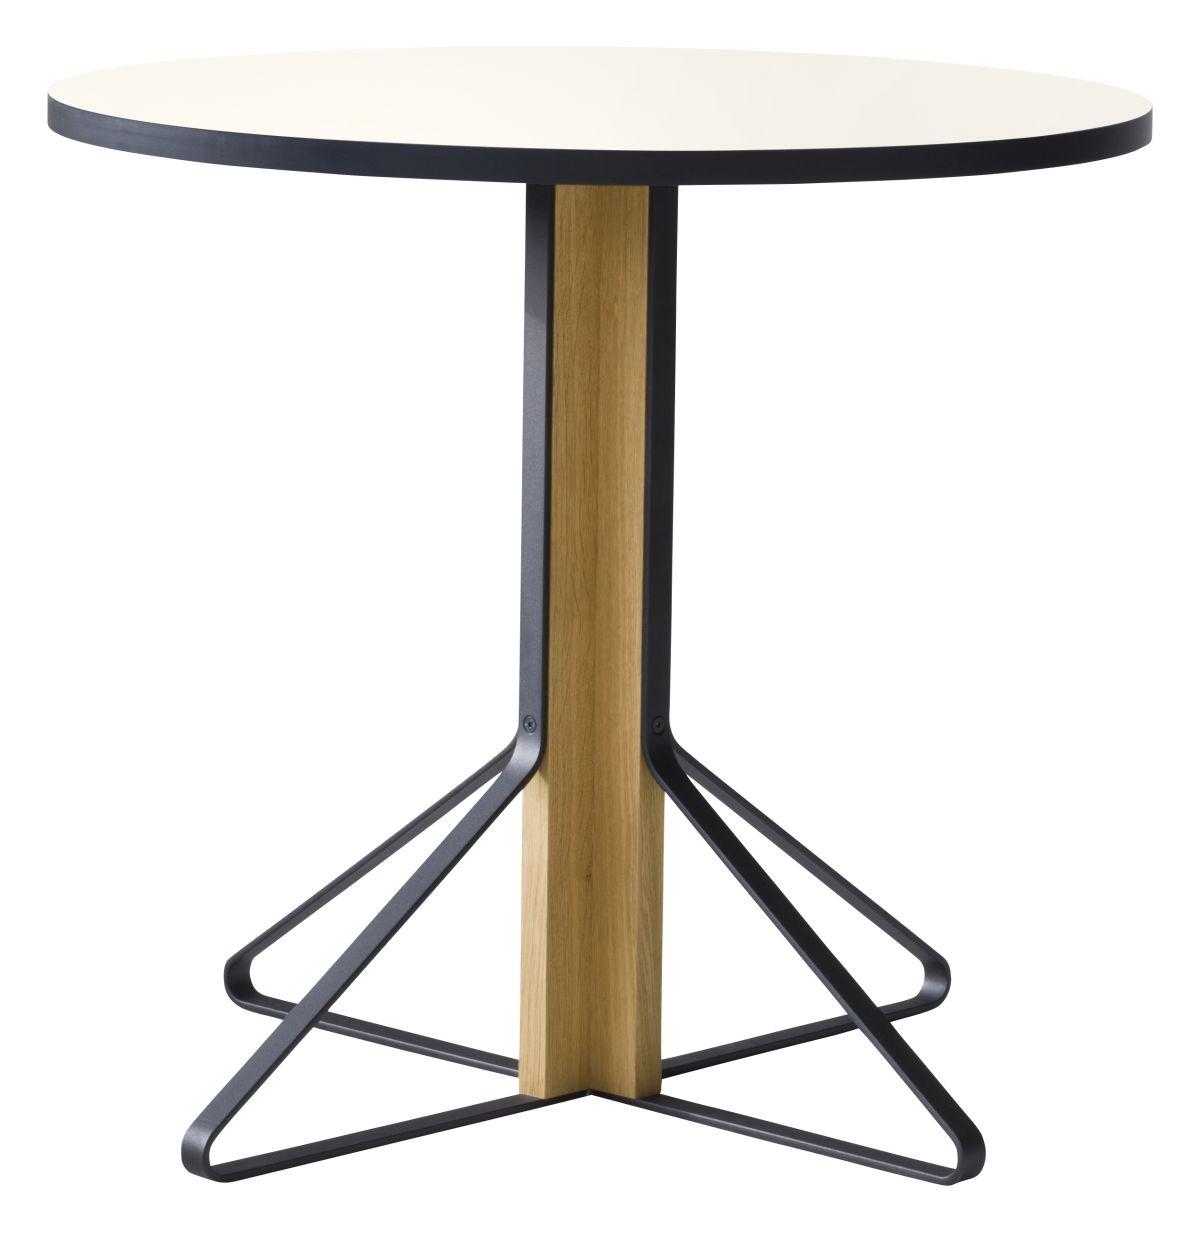 Kaari Table round REB003 natural oak white HPL